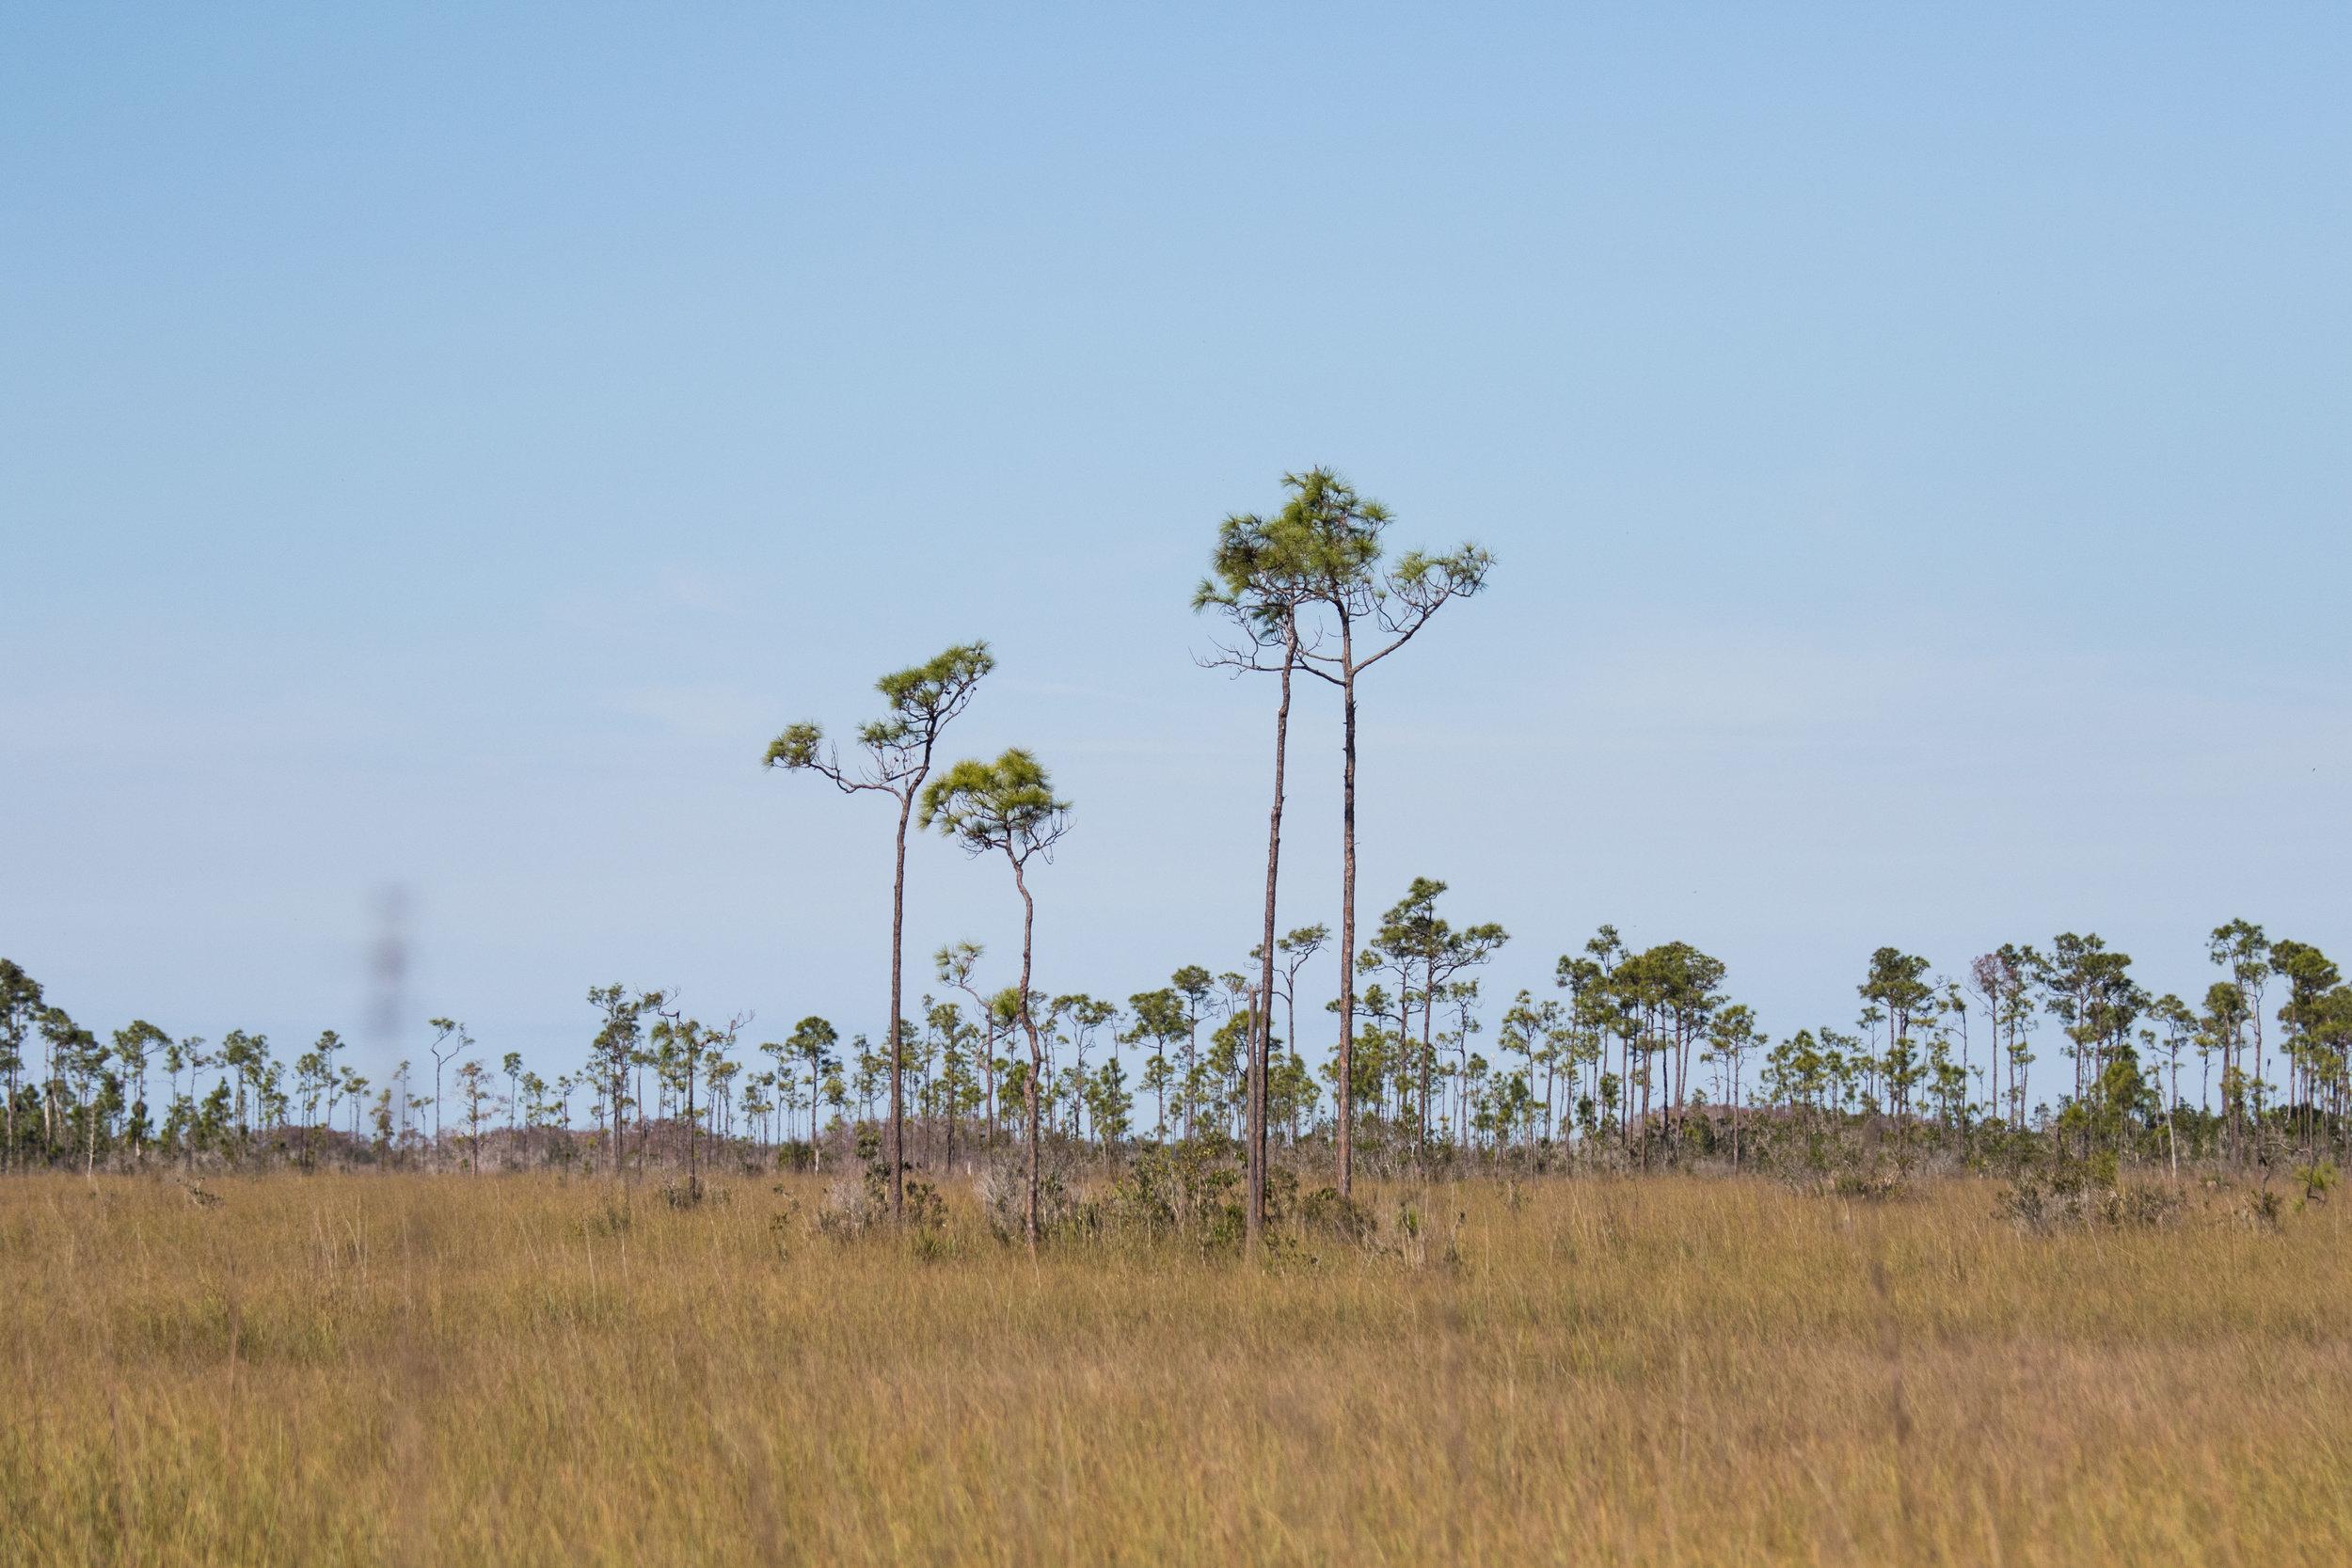 2019_Everglades-129.jpg